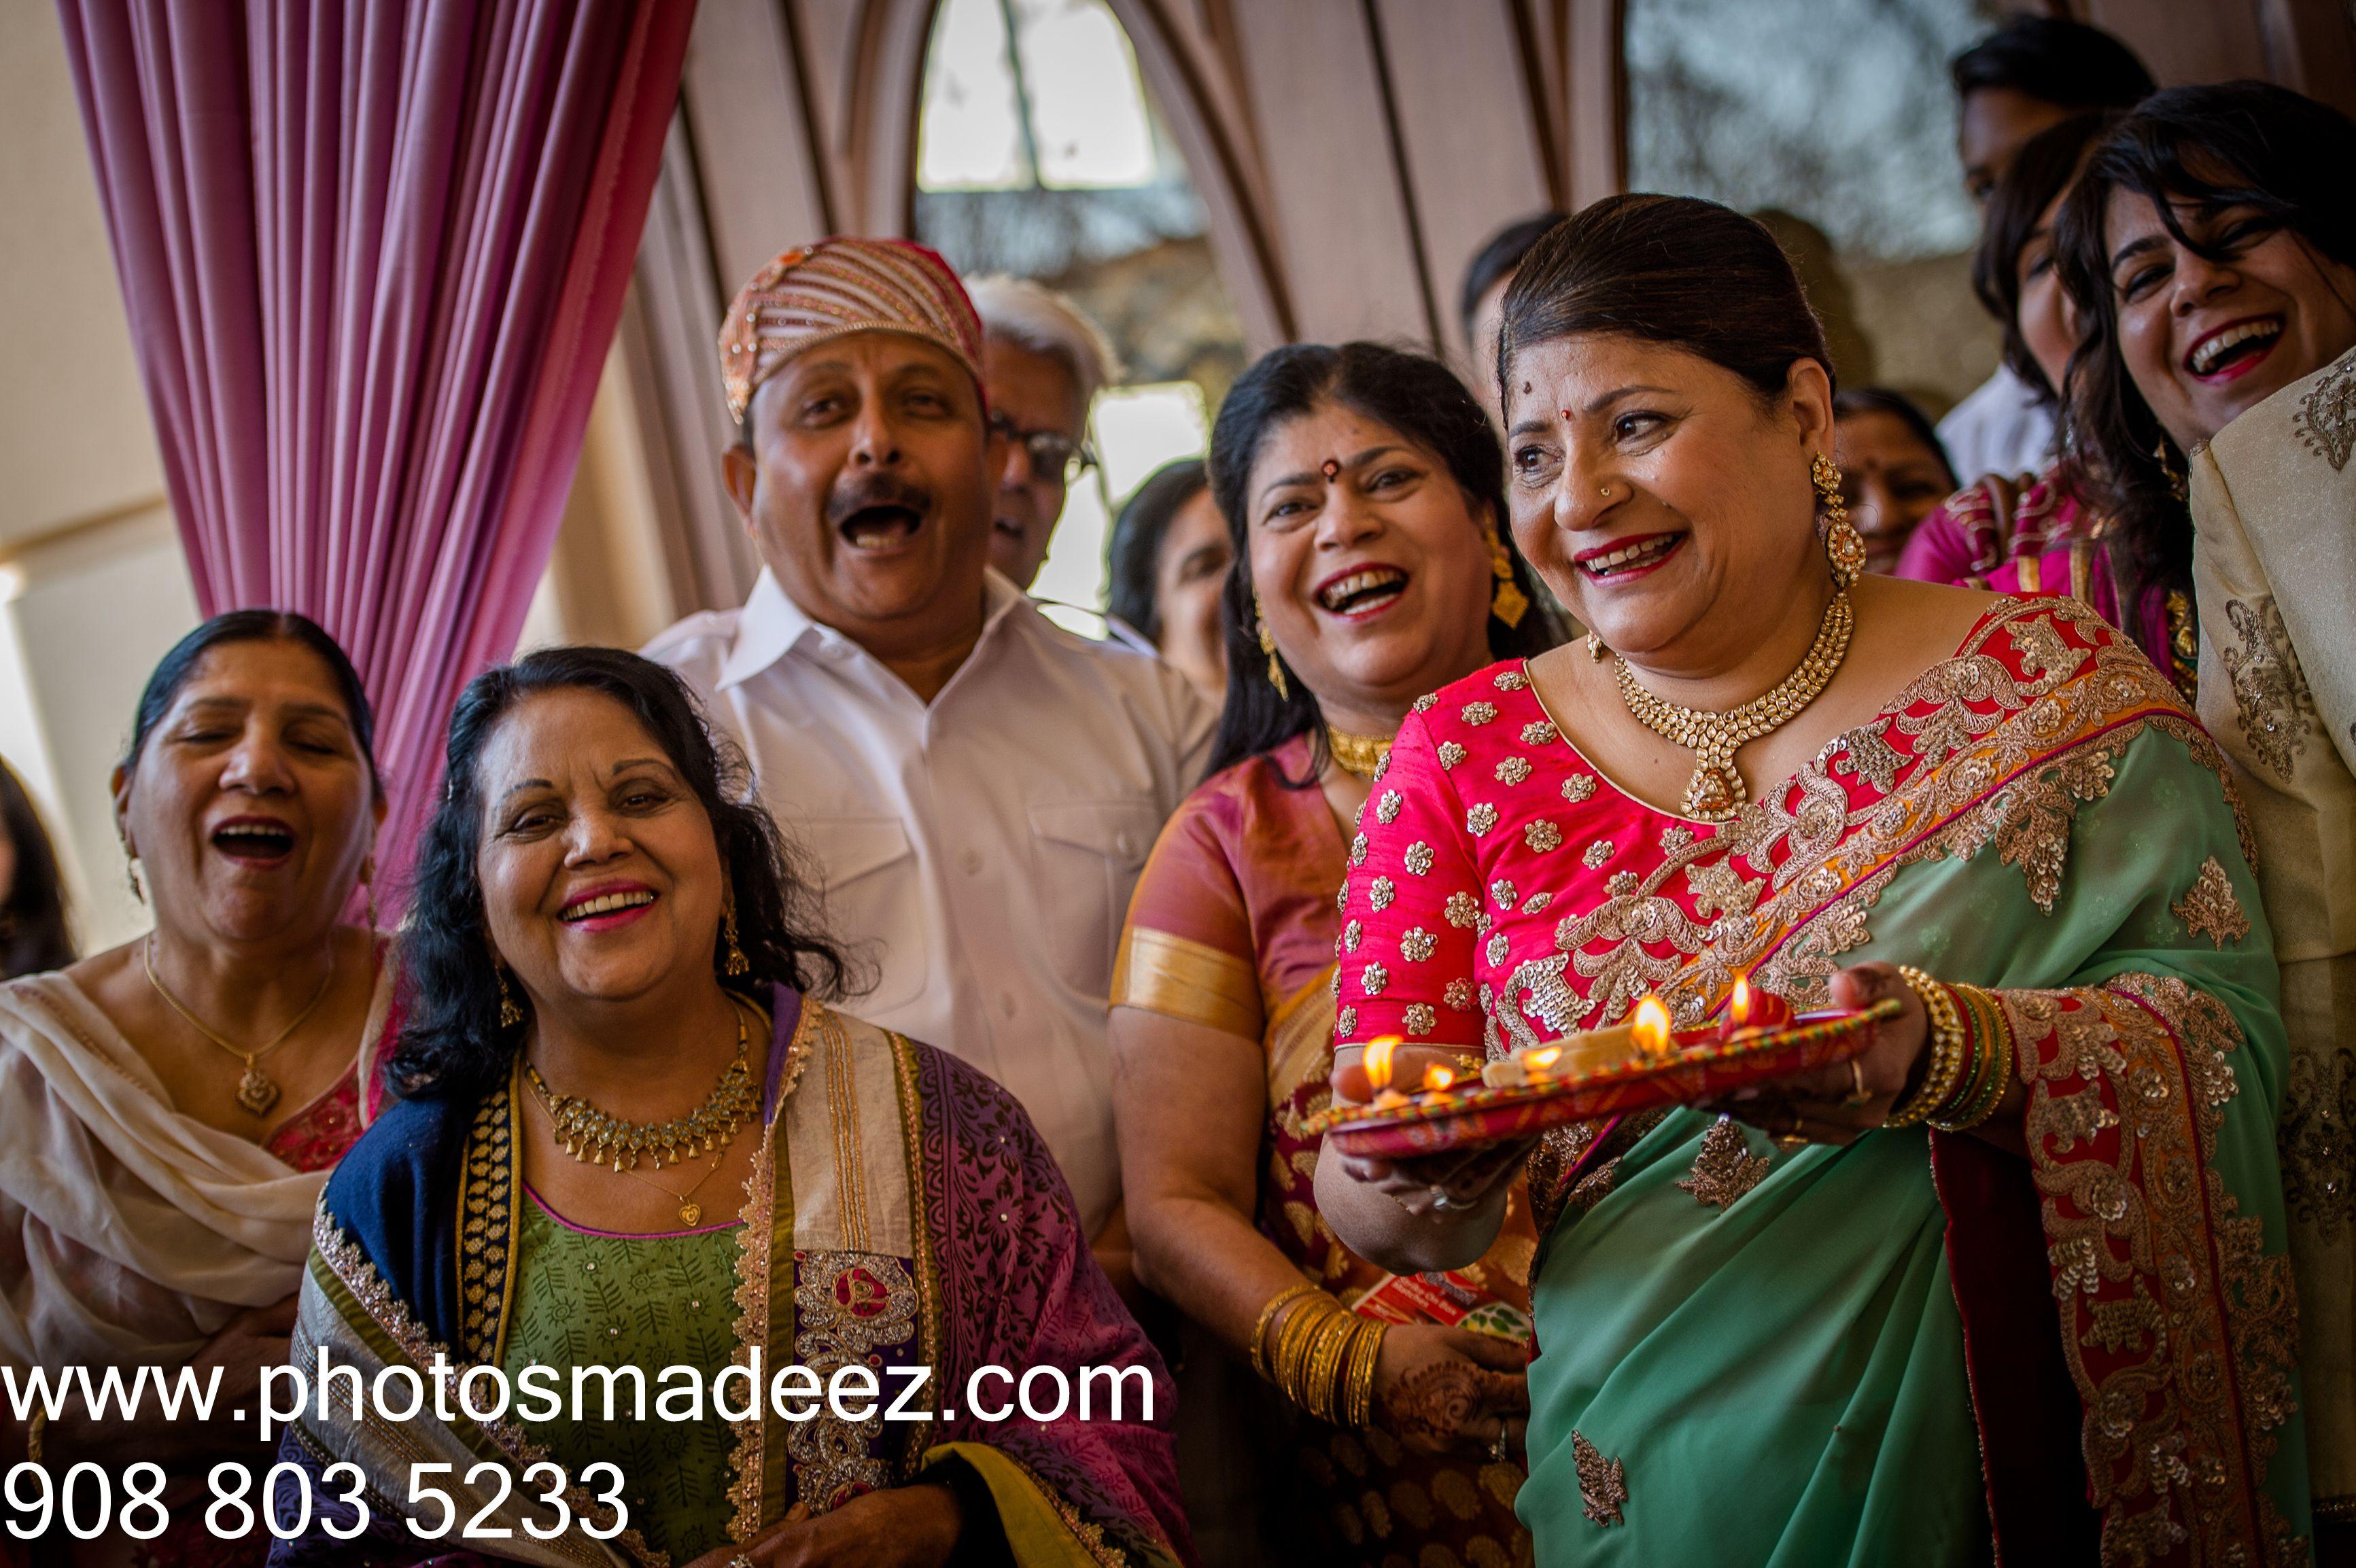 baraat for the punjabi groom at the venetian nj indian wedding rh pinterest com